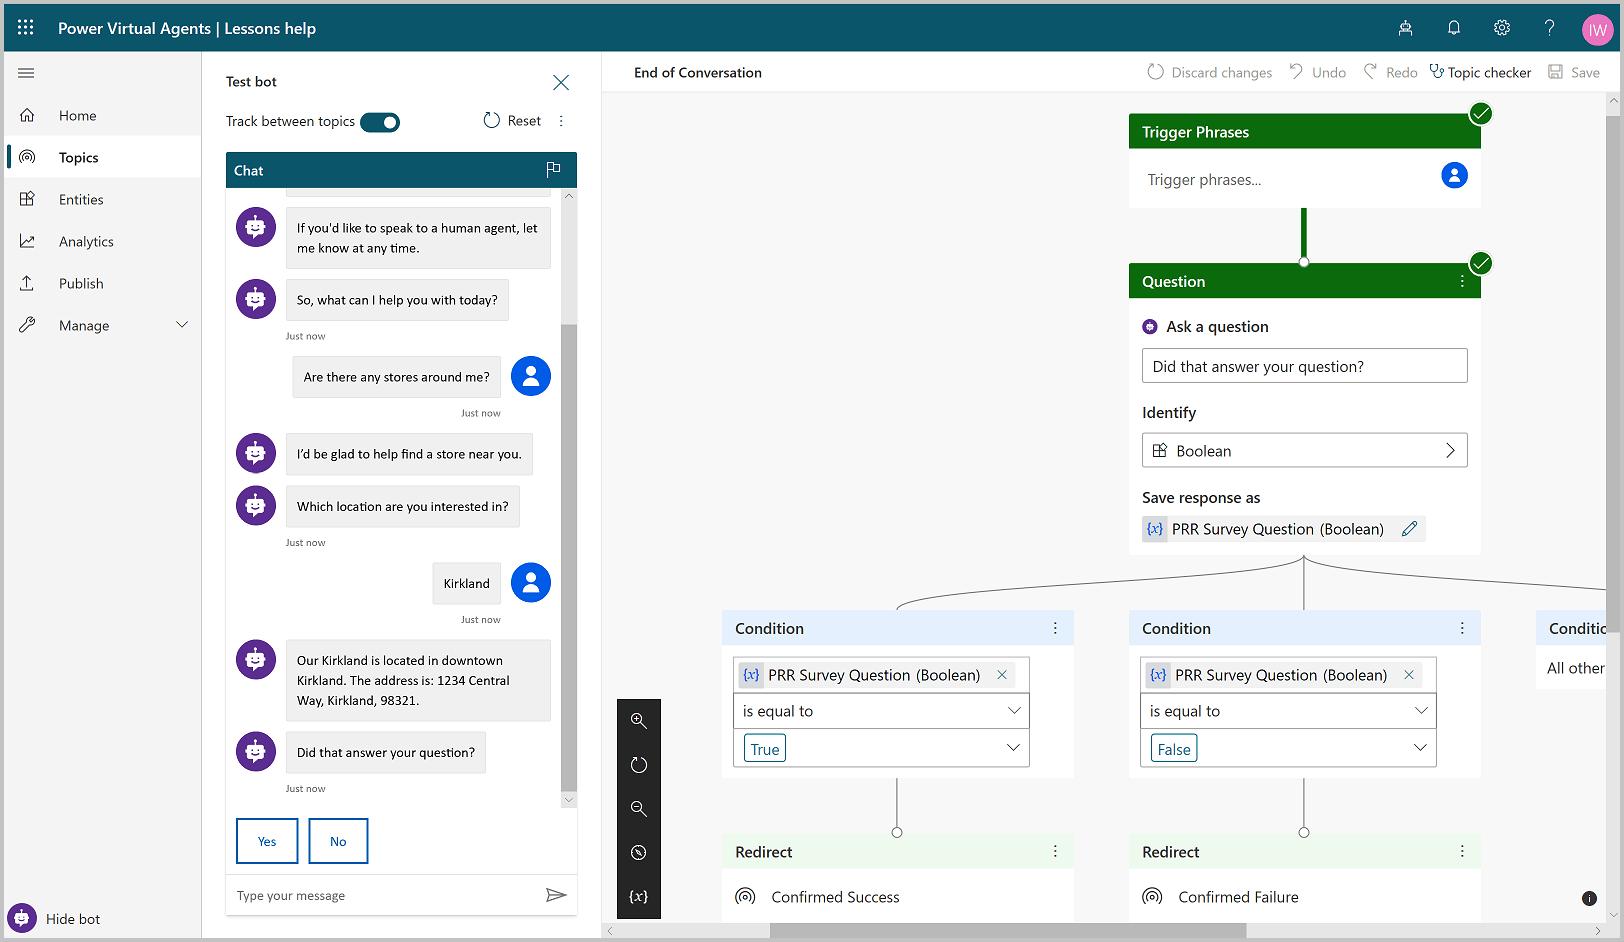 Diseño del chatbot en Power Virtual Agents